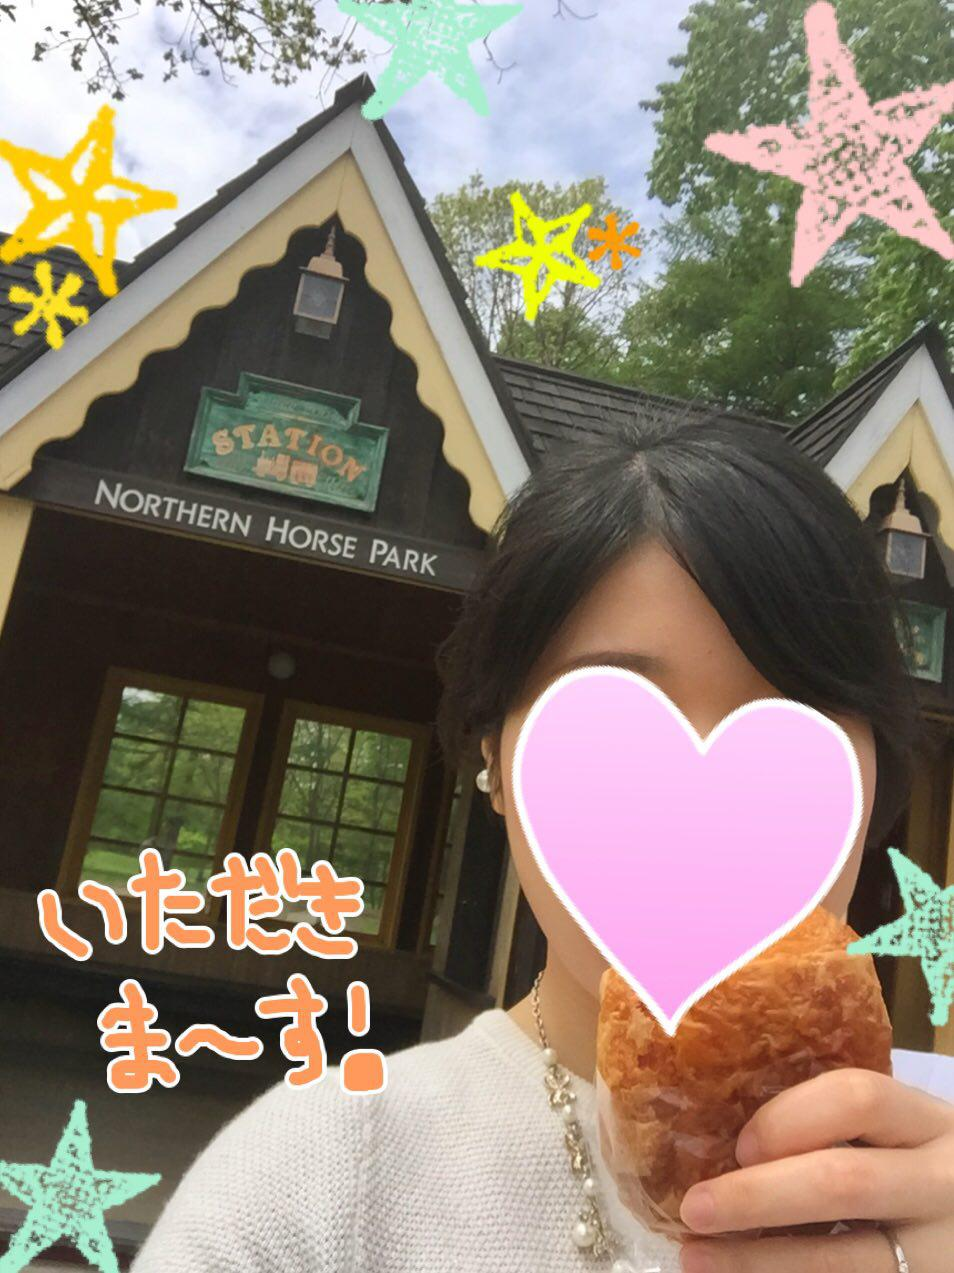 photo_2017-05-26_19-22-51.jpg